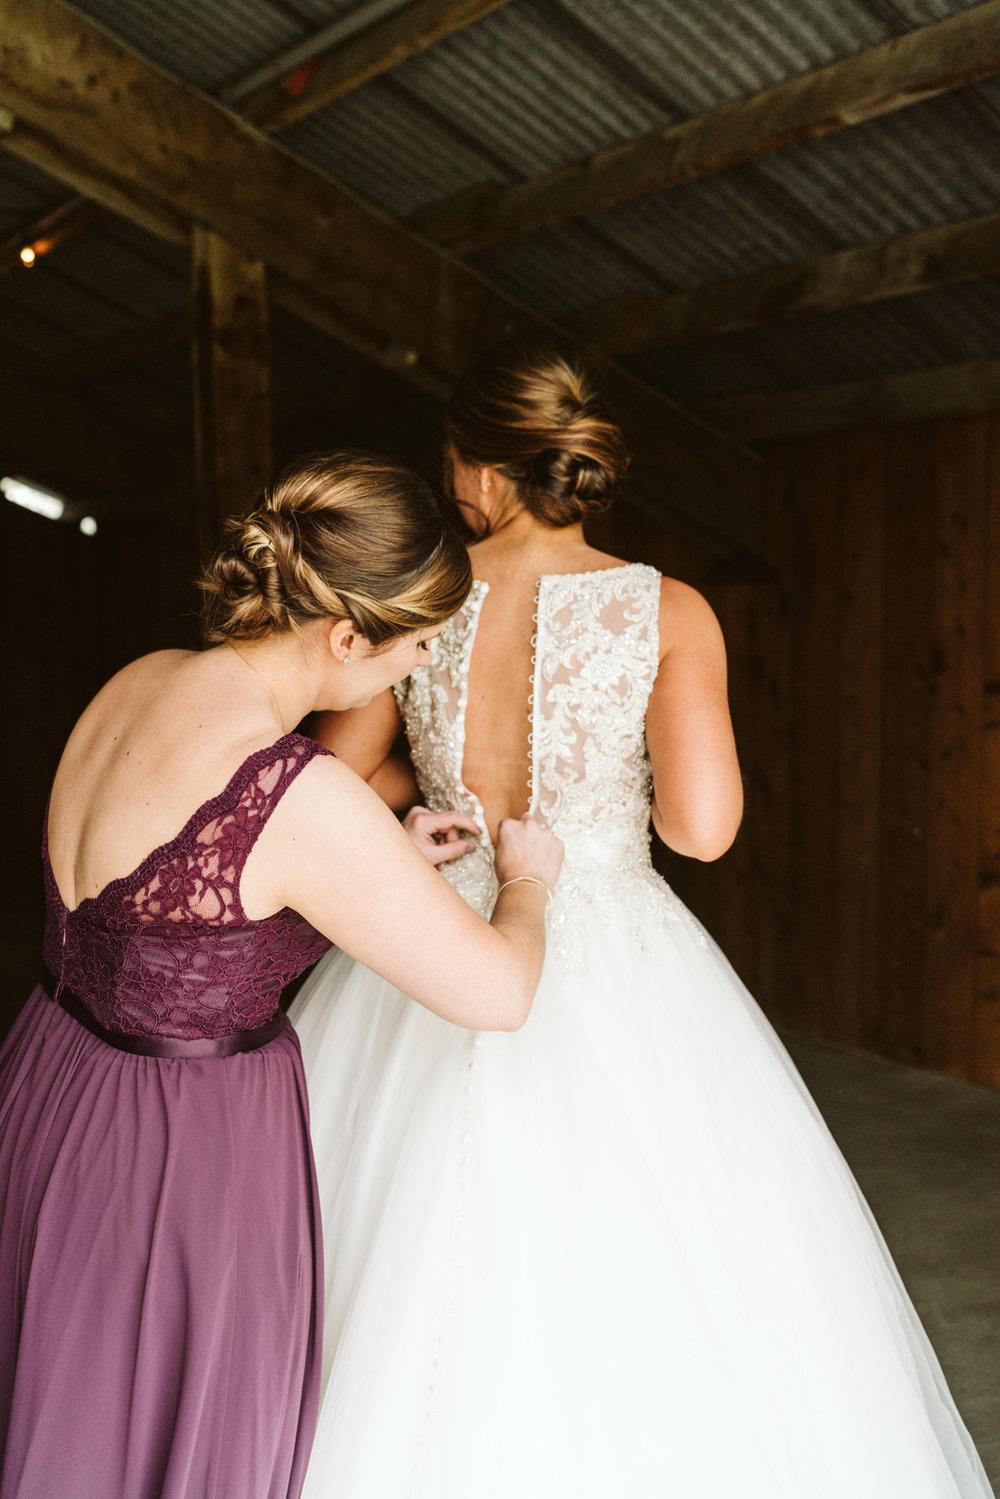 April Yentas Photography - jen and anthony wedding-20.jpg